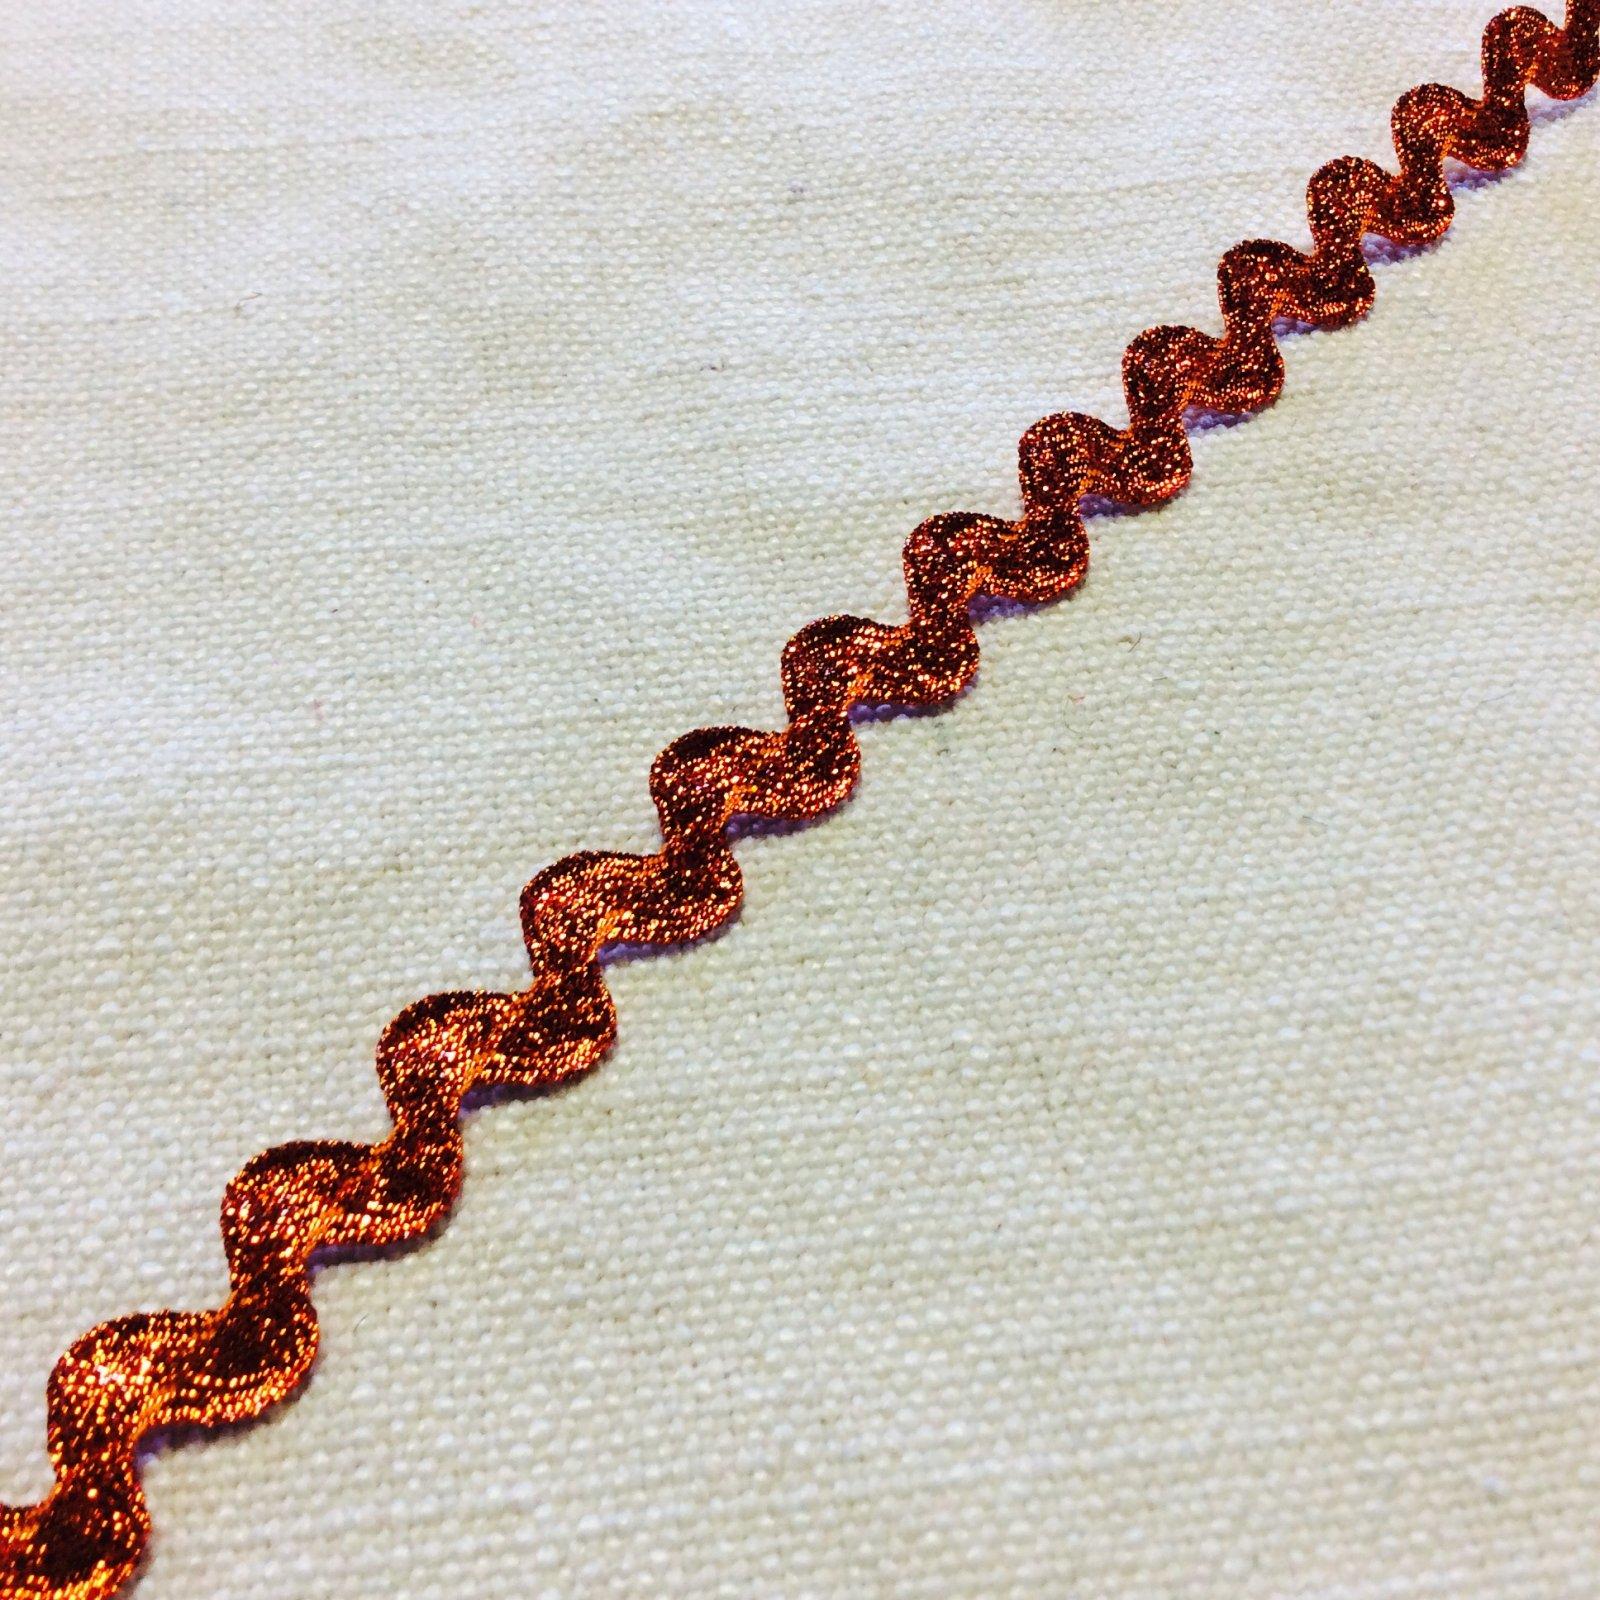 Metallic Orange 3/8 Wide Ric Rac Ribbon Trim RIB1336